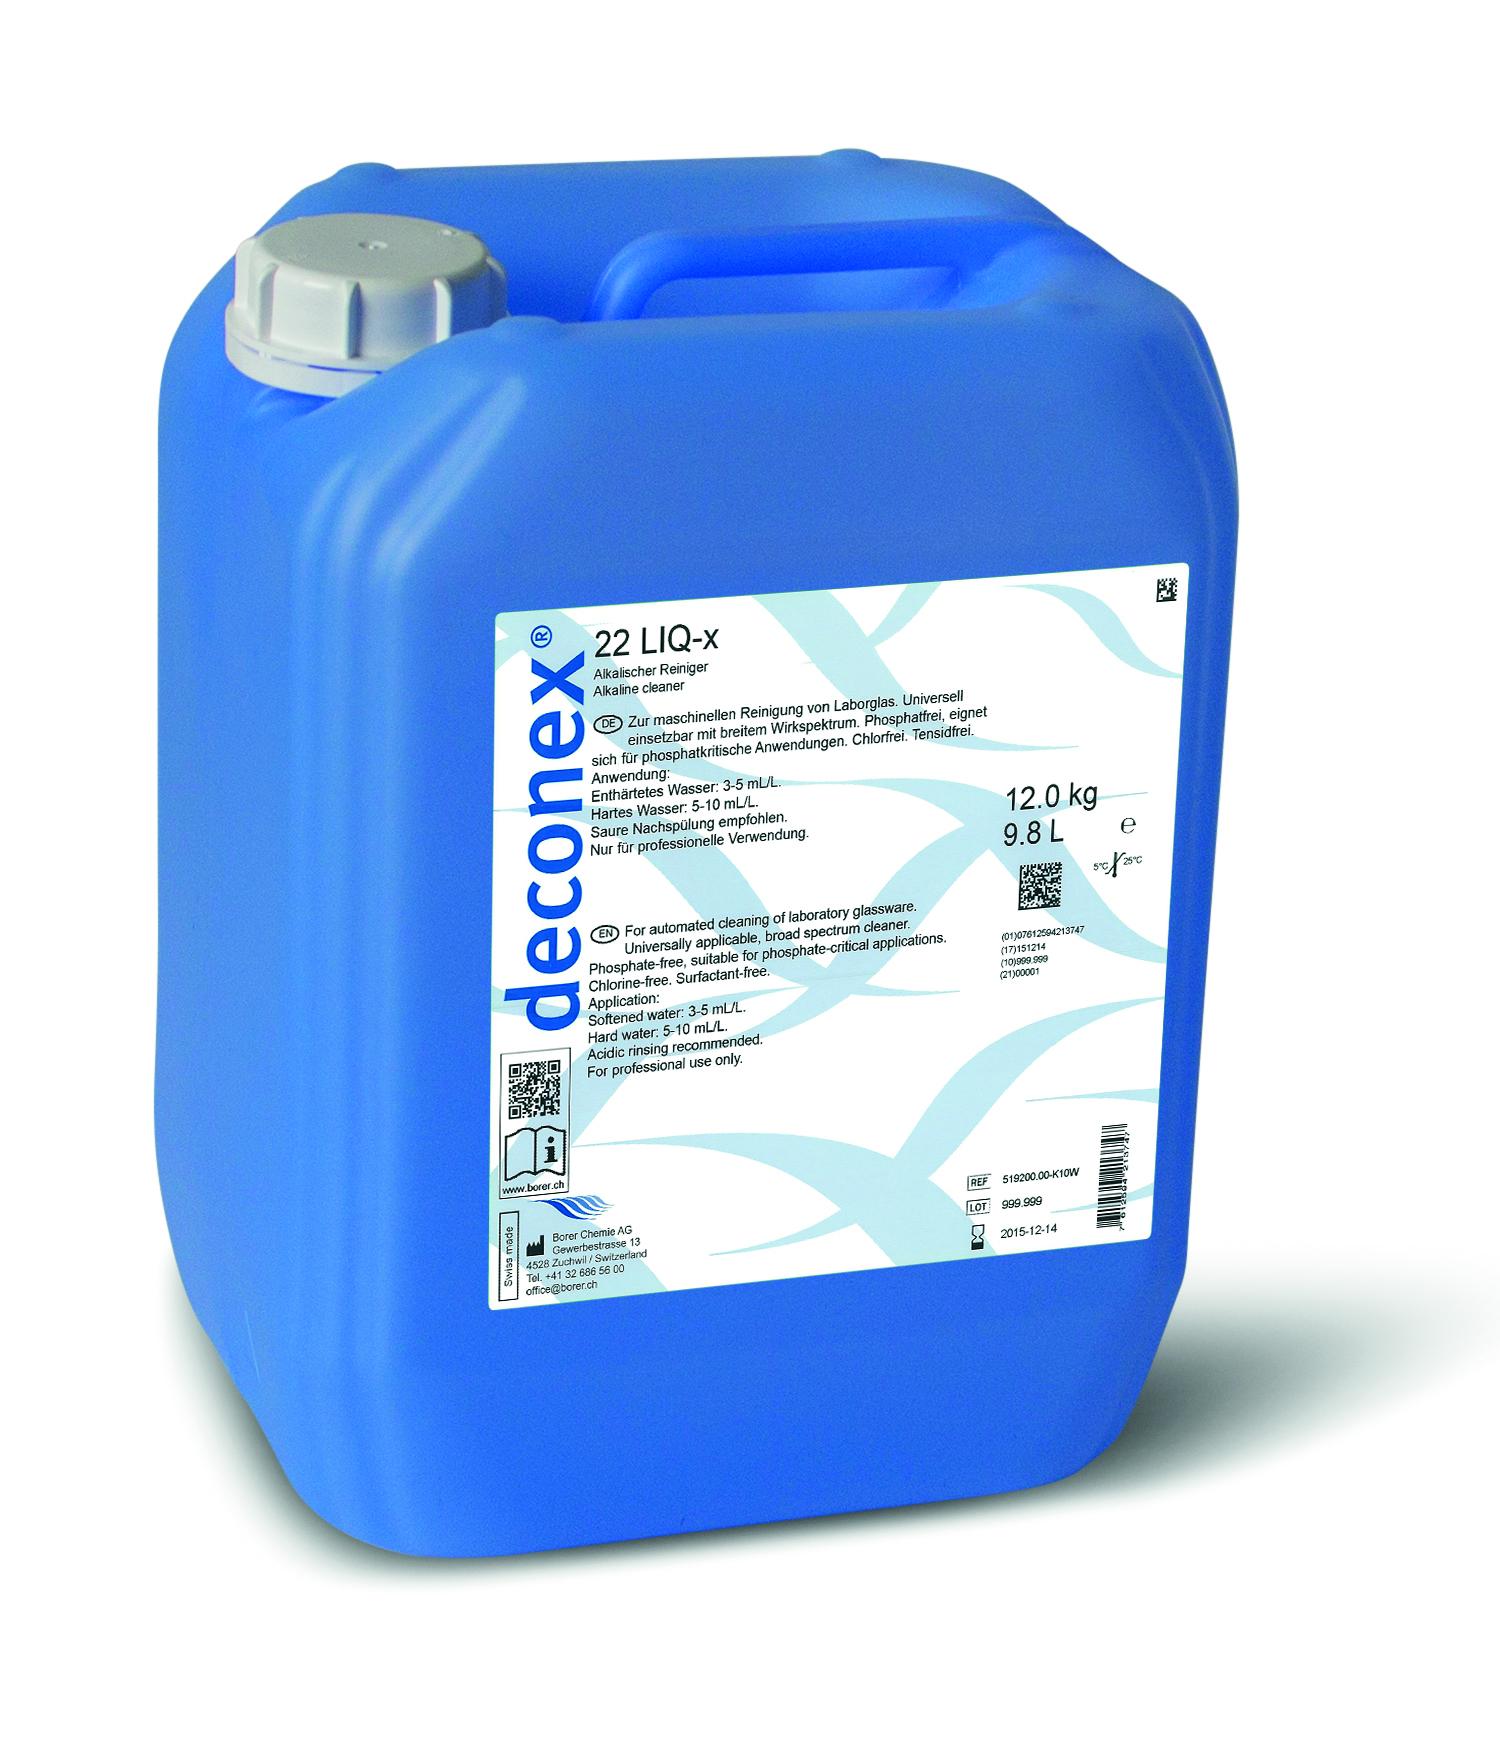 deconex® 22 LIQ-x, vloeibaar   (63050549.9012)